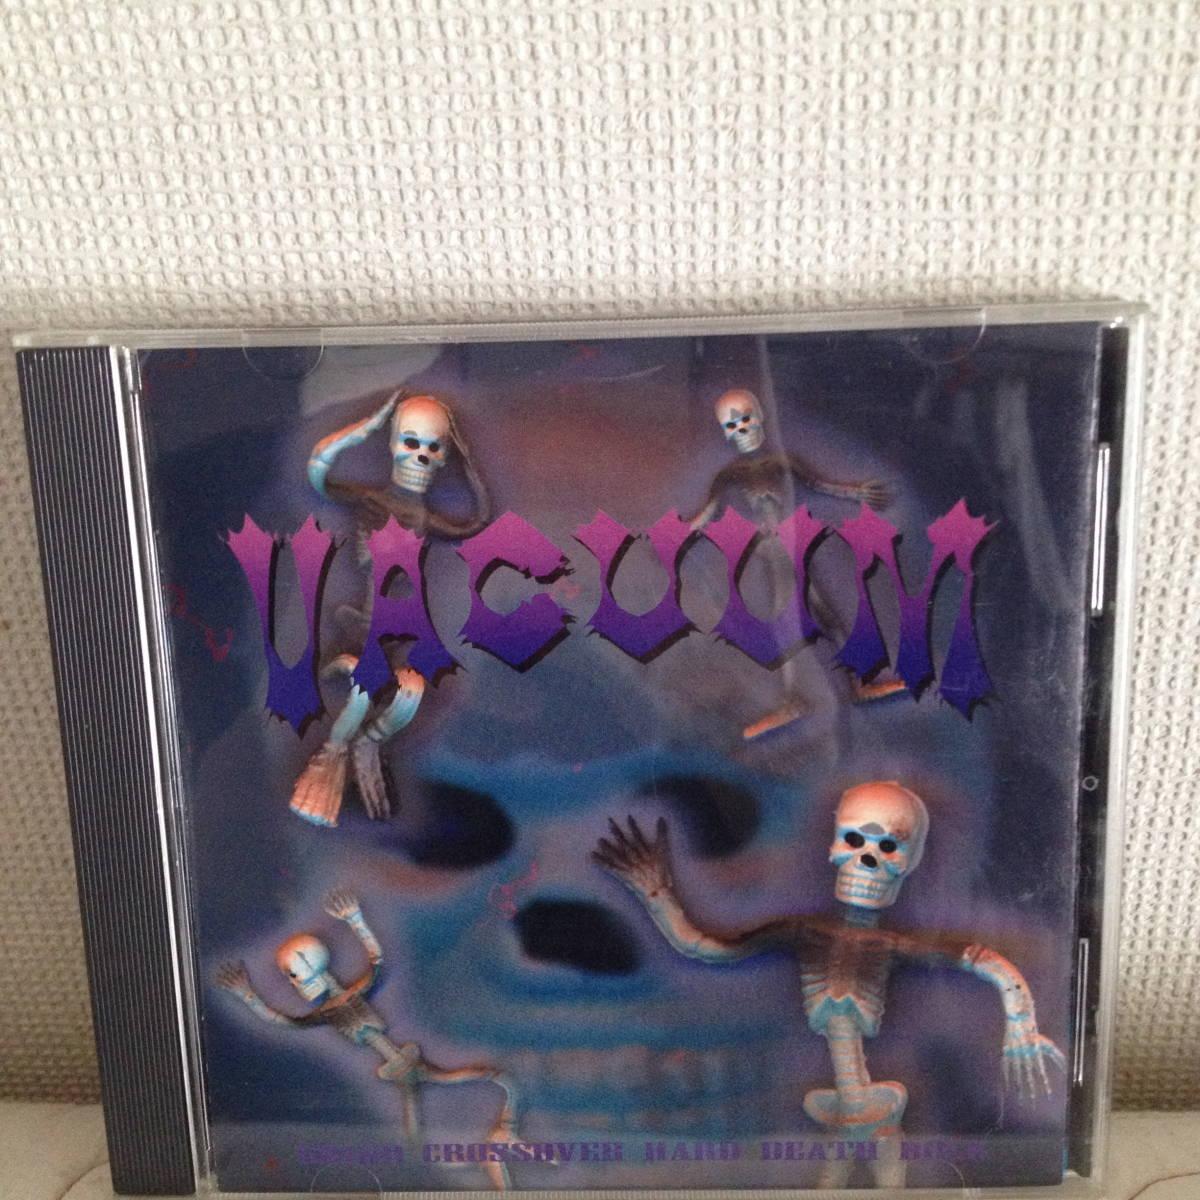 VACUUM EP SHADY GLIMPSE 静岡浜松ジャパニーズスラッシュメタル 貴重  _画像1